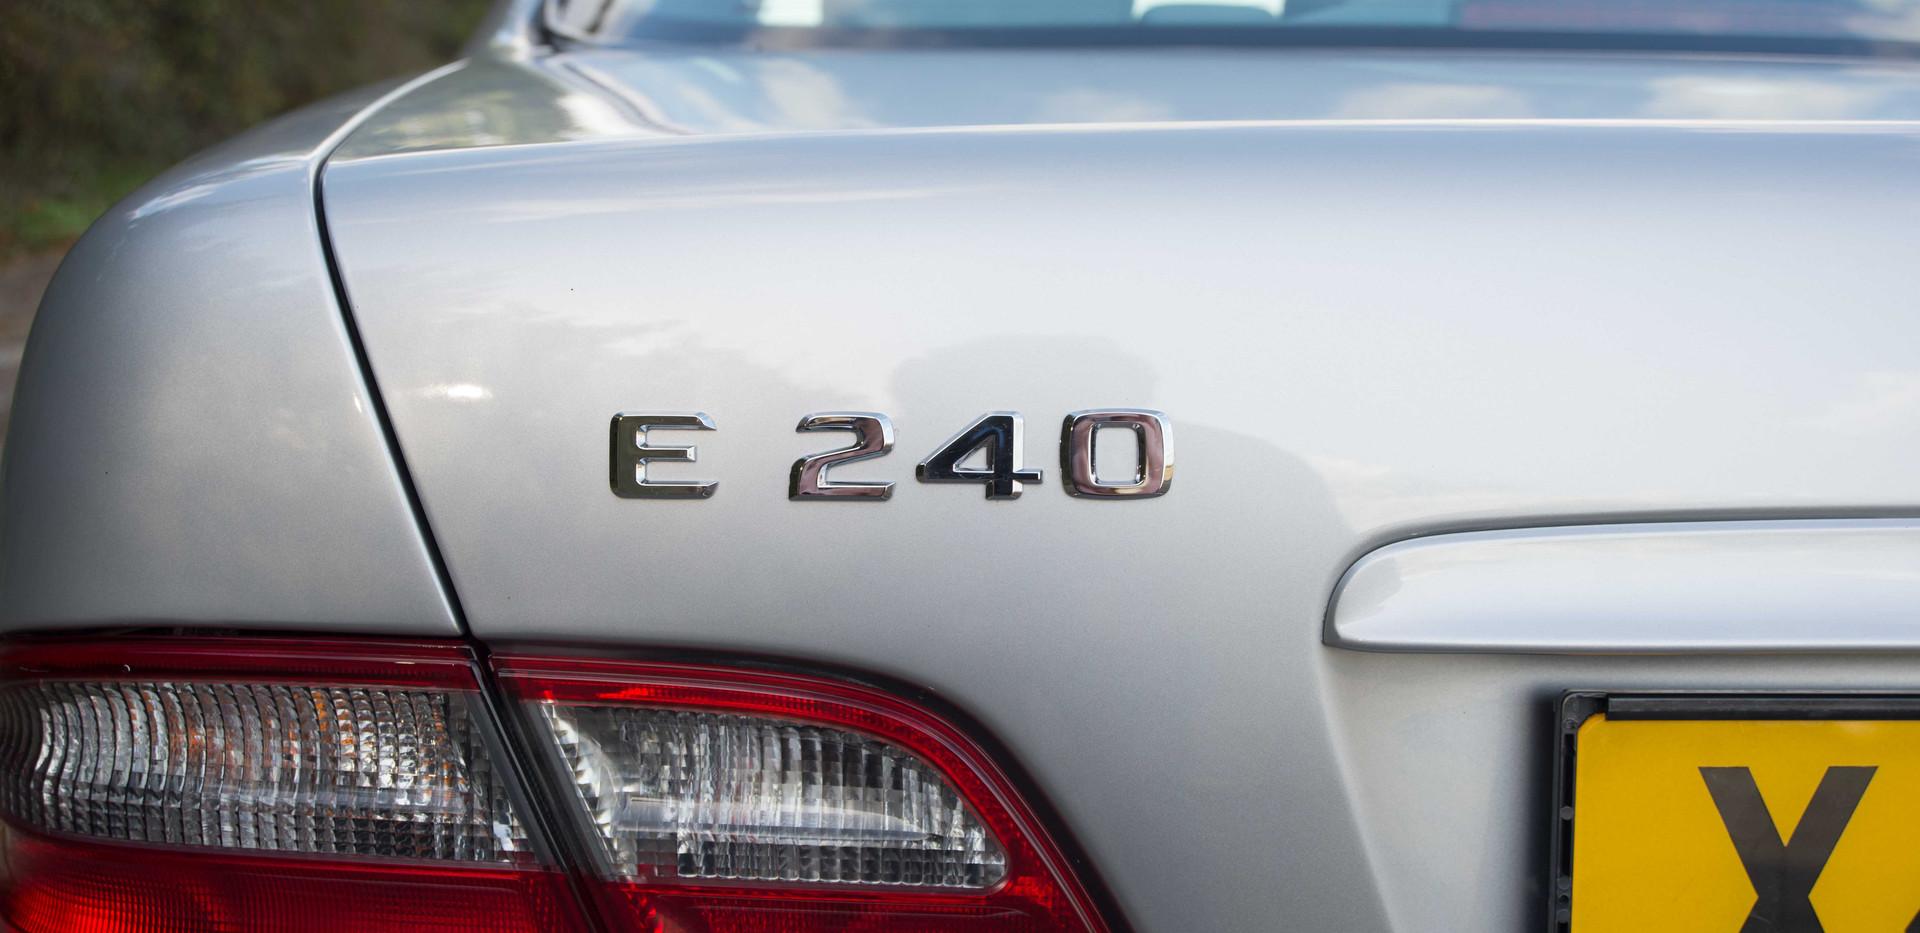 Mercedes E240 For Sale UK London  (43 of